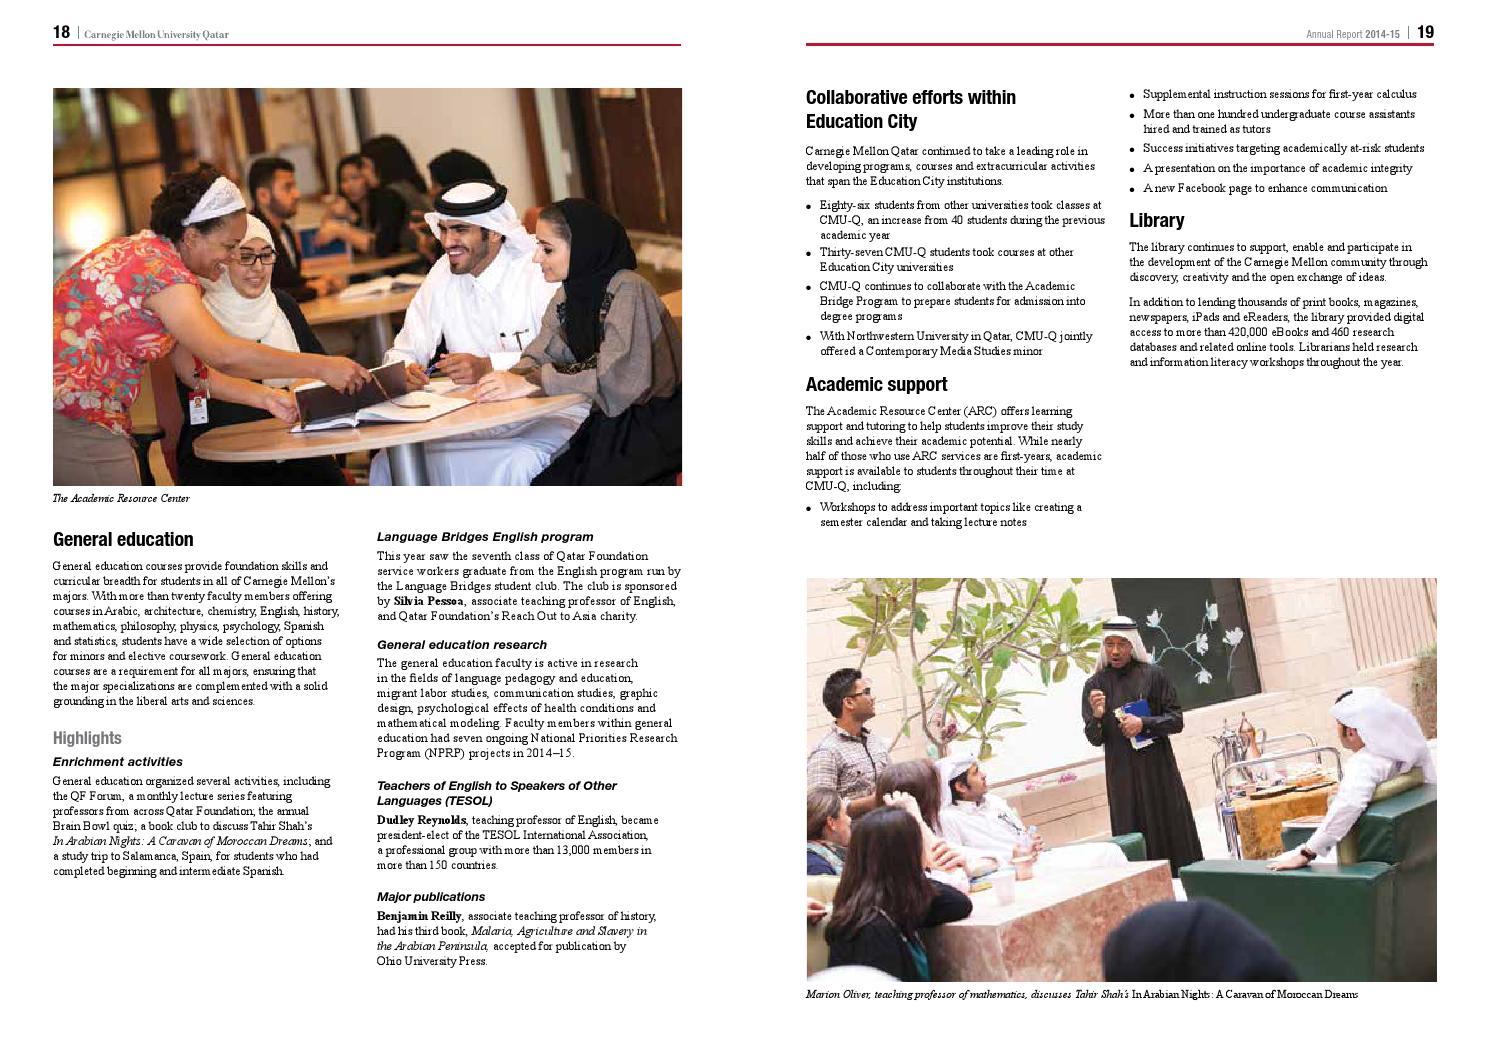 Cmu Academic Calendar.Carnegie Mellon Qatar Annual Report For 2014 2015 By Carnegie Mellon